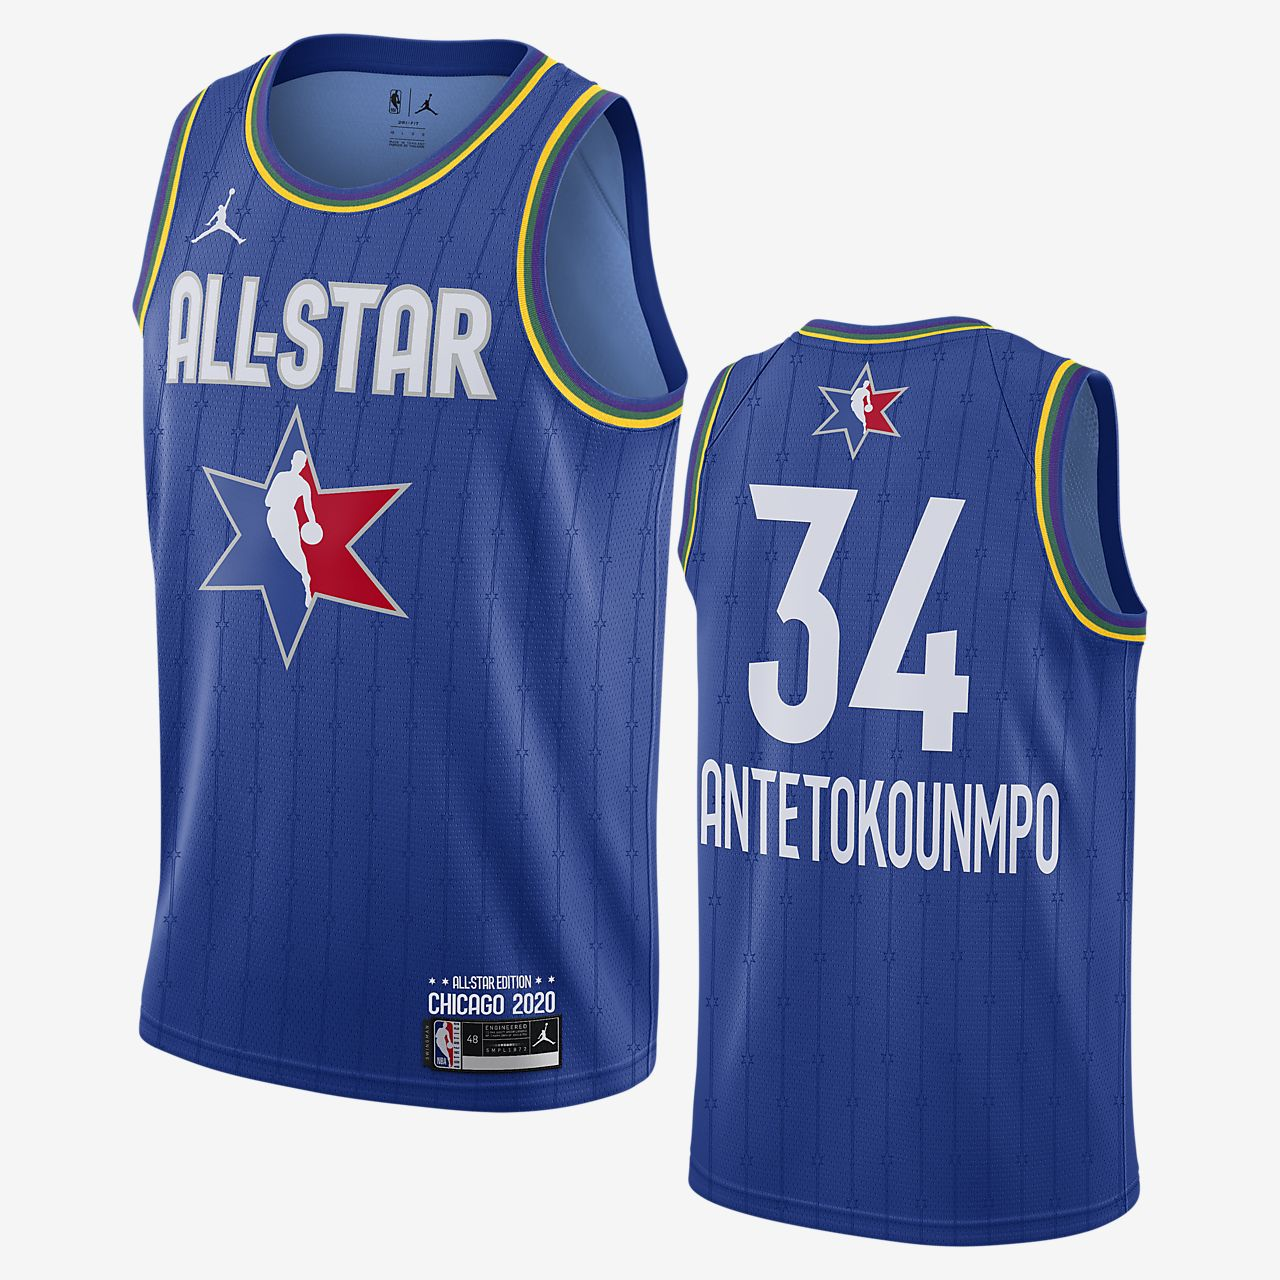 Maillot Jordan NBA Swingman Giannis Antetokounmpo All-Star